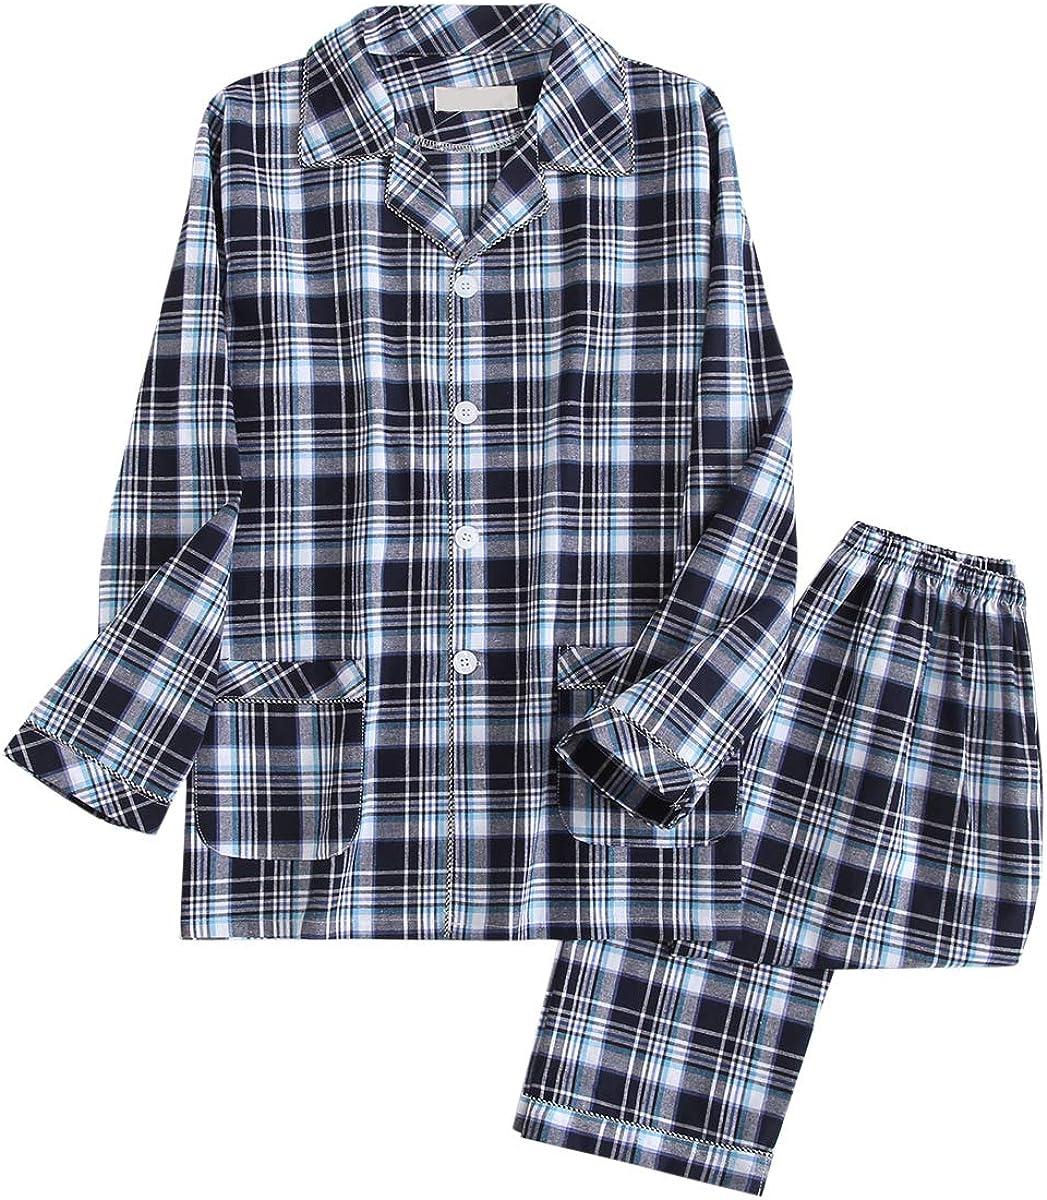 Mens Plaid Pajamas Set Cotton Woven Sleepwear 2 Piece Button Down Top Pants